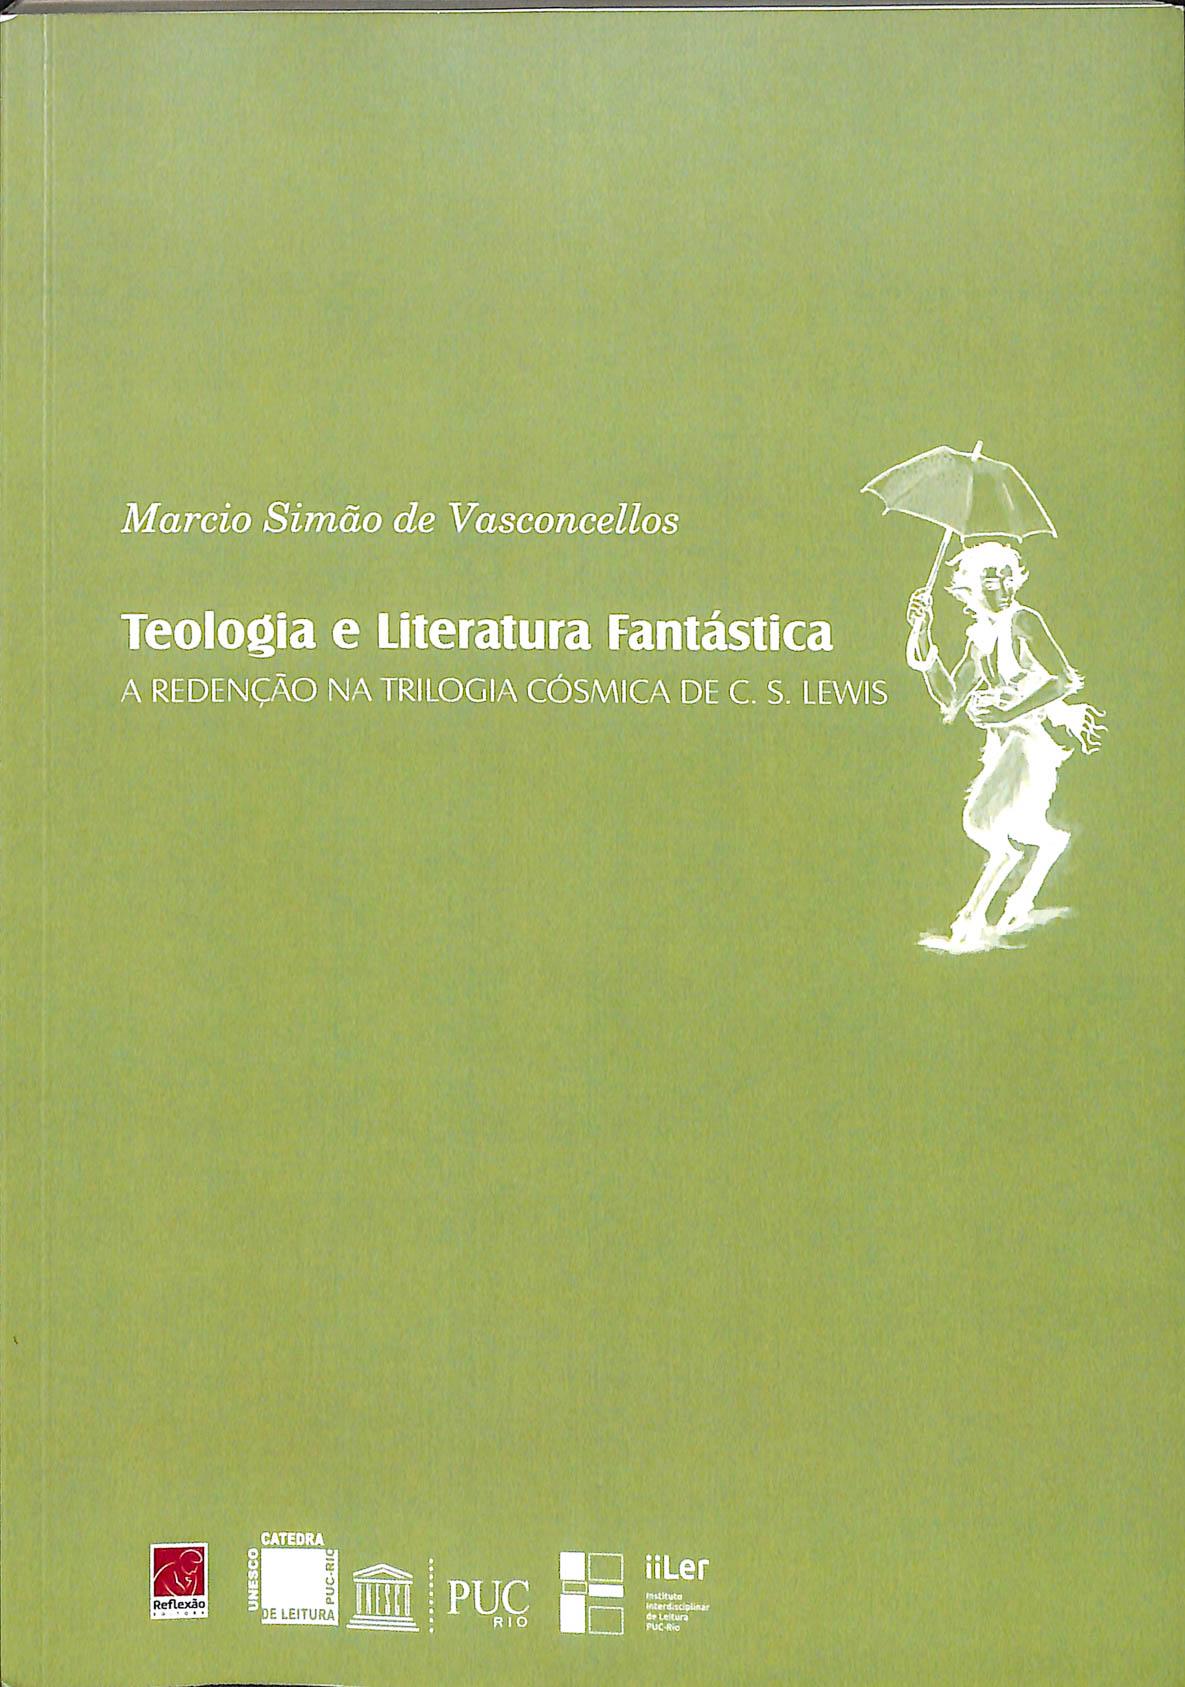 TEOLOGIA E LITERATURA FANTÁSTICA